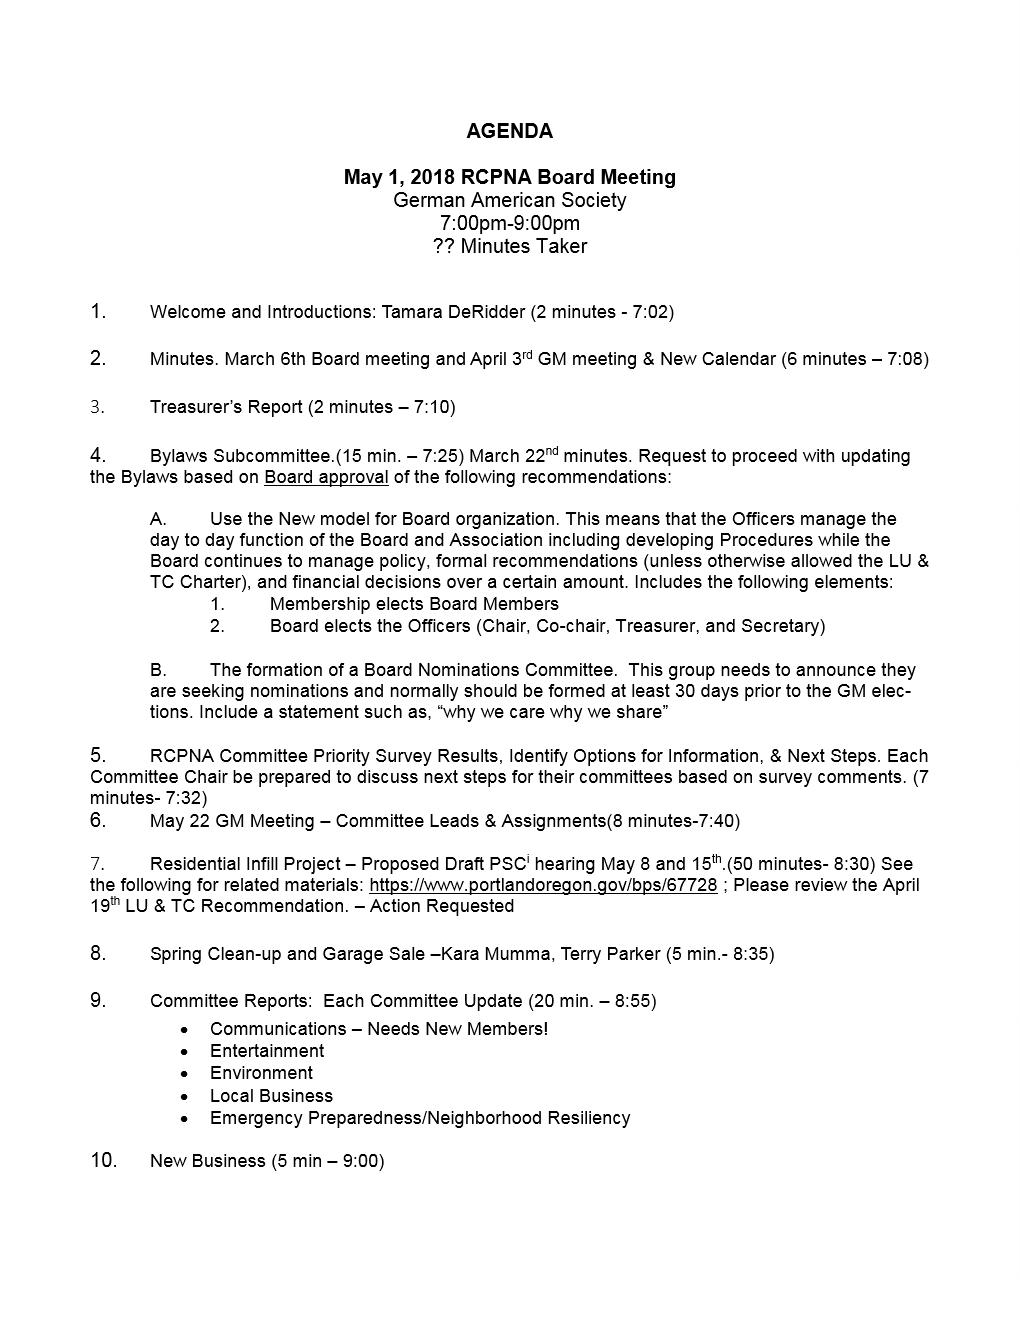 meeting document